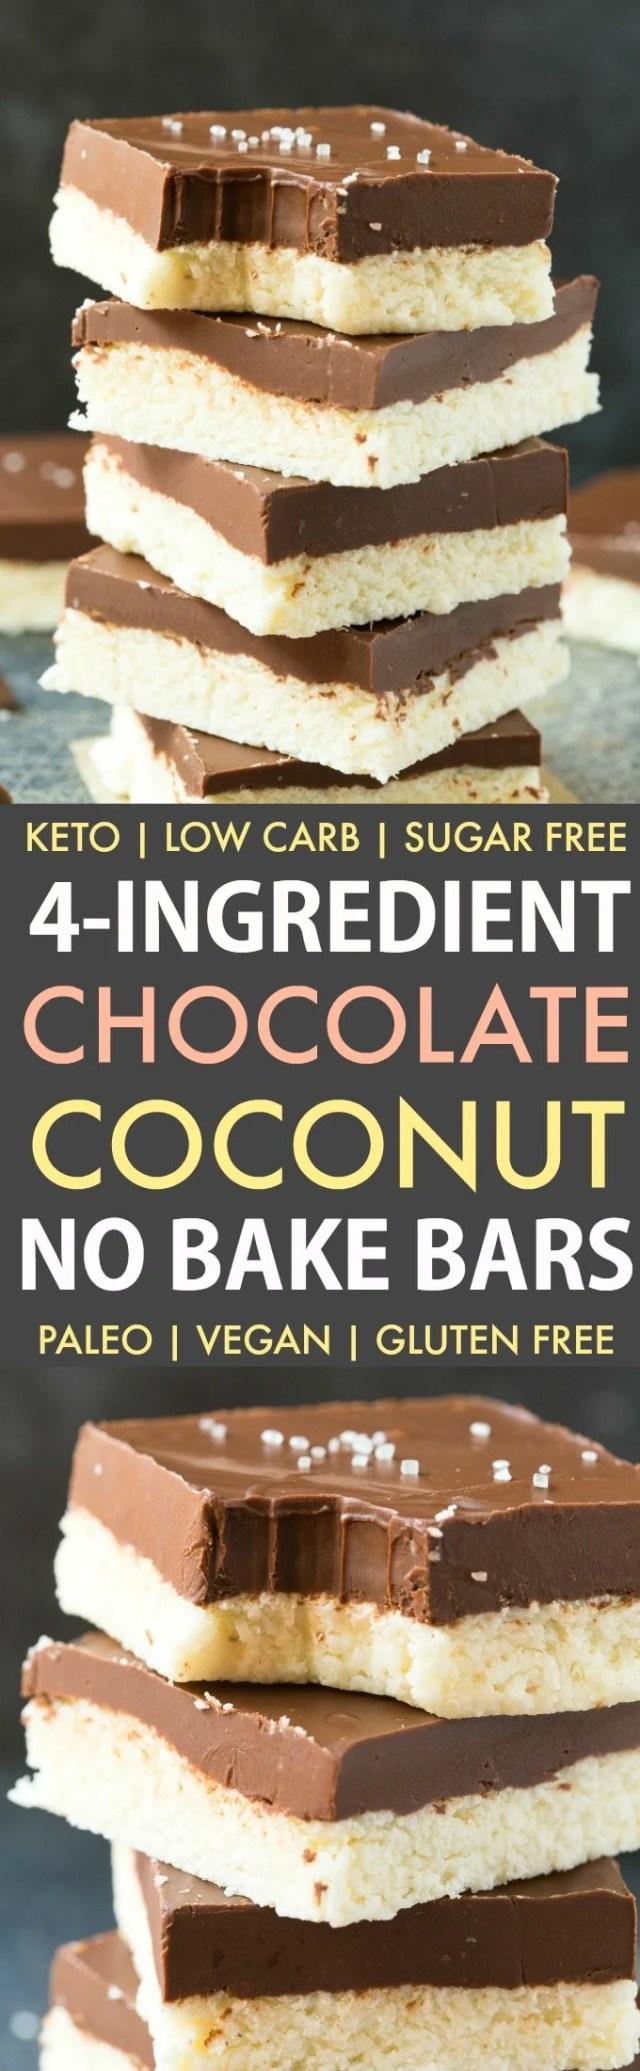 Healthy 4-Ingredient Paleo Vegan Chocolate Coconut Bars